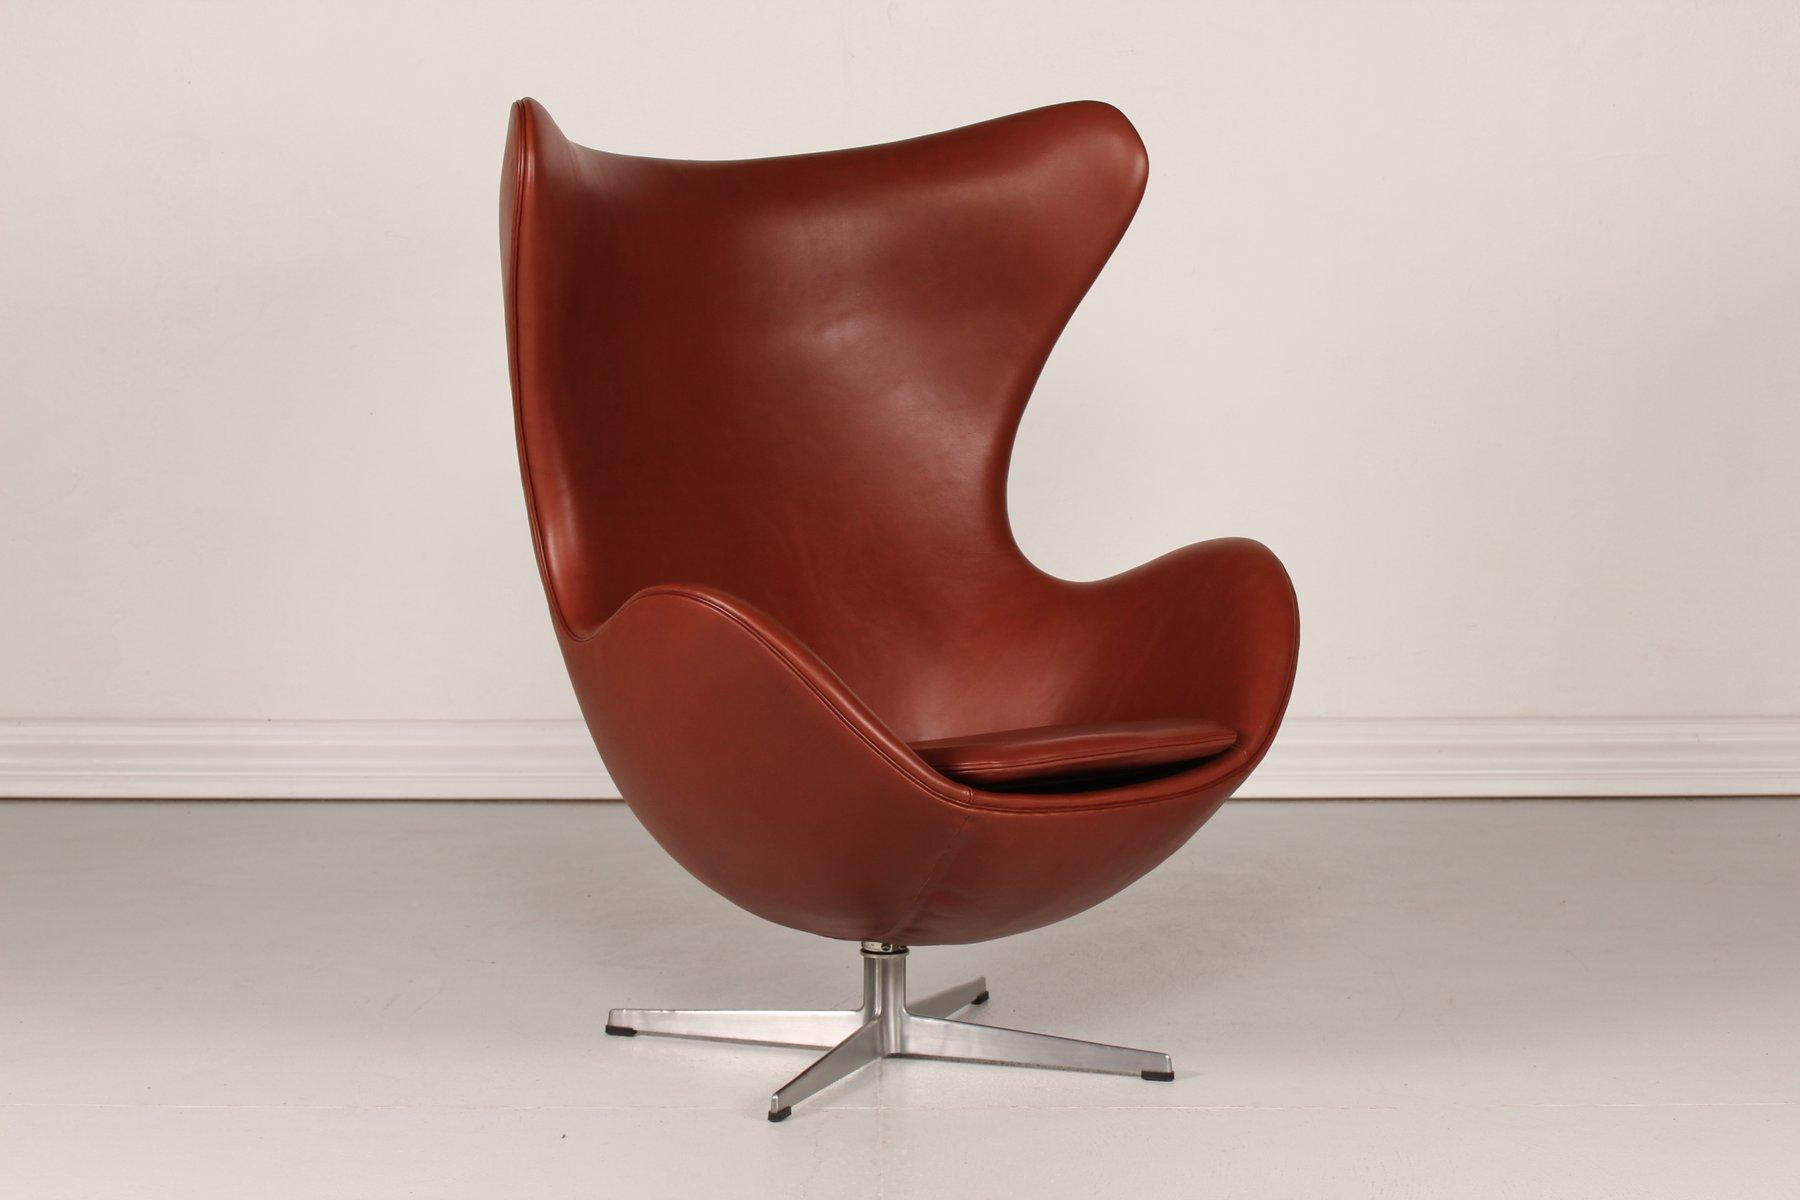 3316 cognac leather egg chair by arne jacobsen for fritz. Black Bedroom Furniture Sets. Home Design Ideas